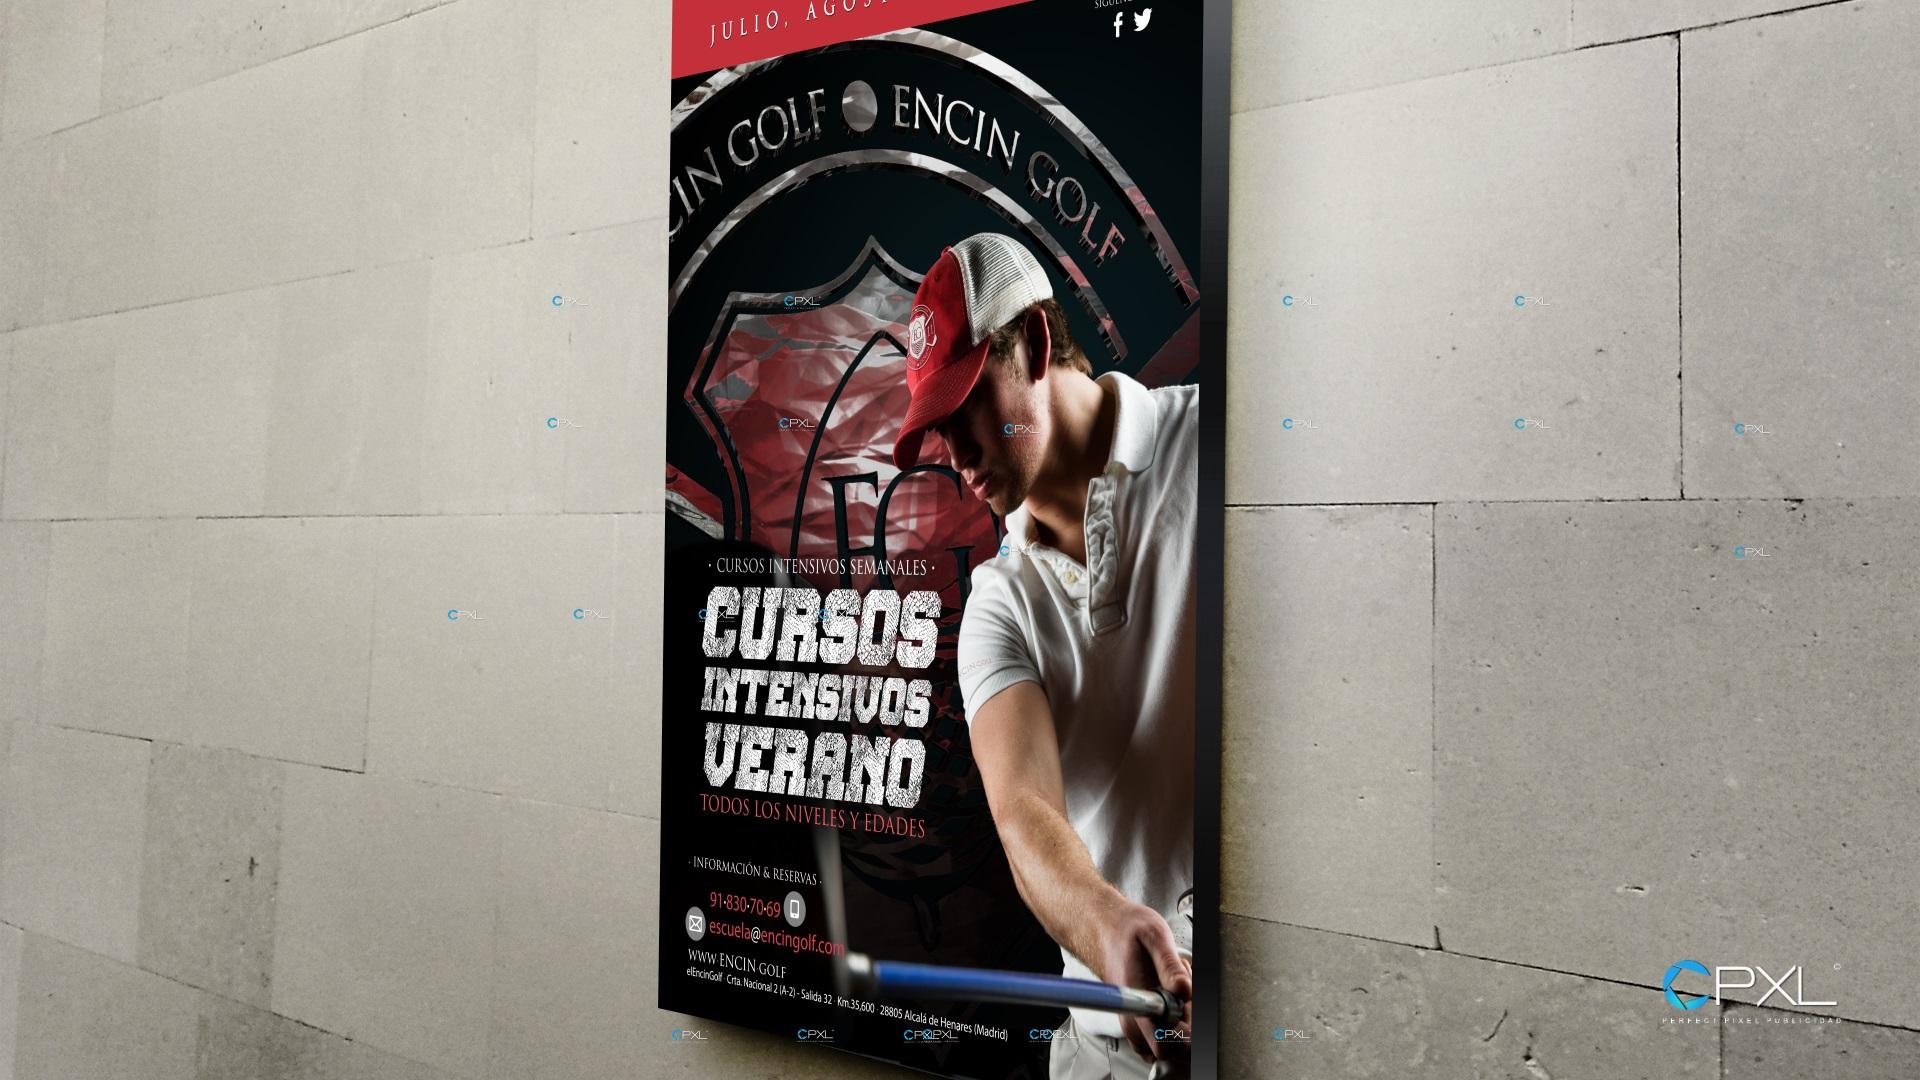 Campaña publicitaria para cursos intensivos de golf en Madrid (Encín Golf)